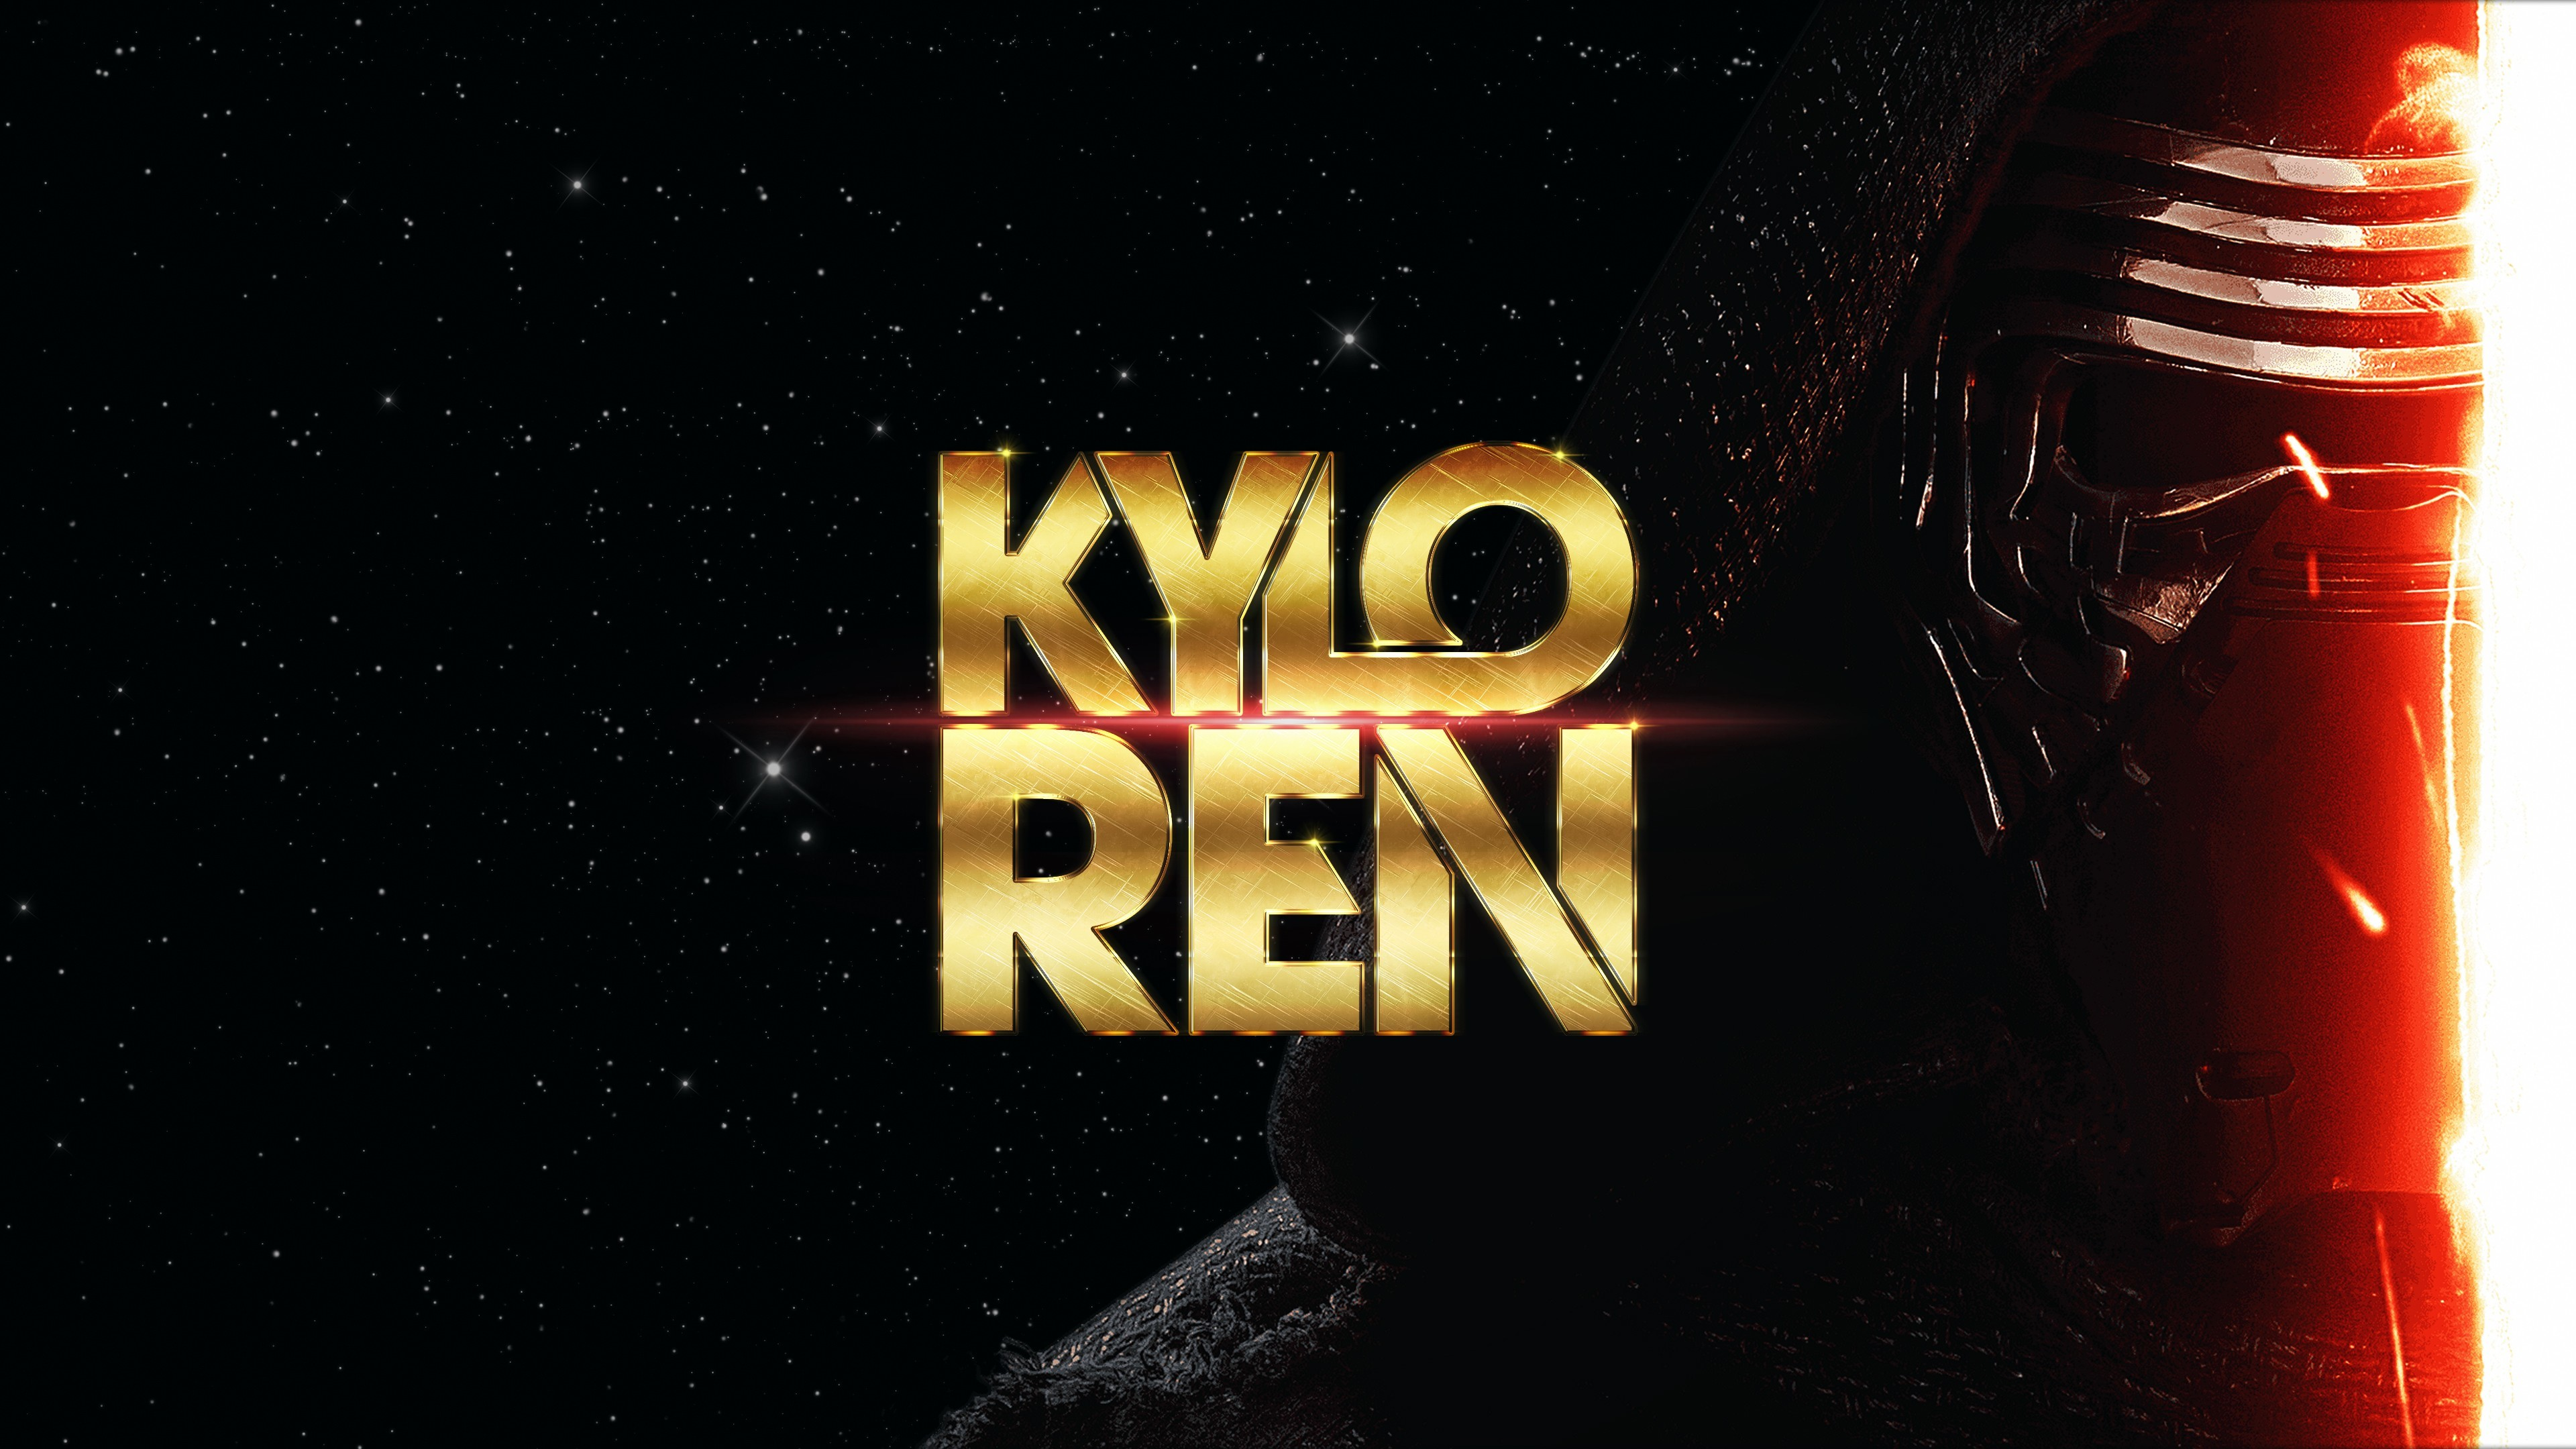 Kylo Ren, Star Wars, Star Wars: Episode VII The Force Awakens, Lightsaber,  Sith Wallpapers HD / Desktop and Mobile Backgrounds